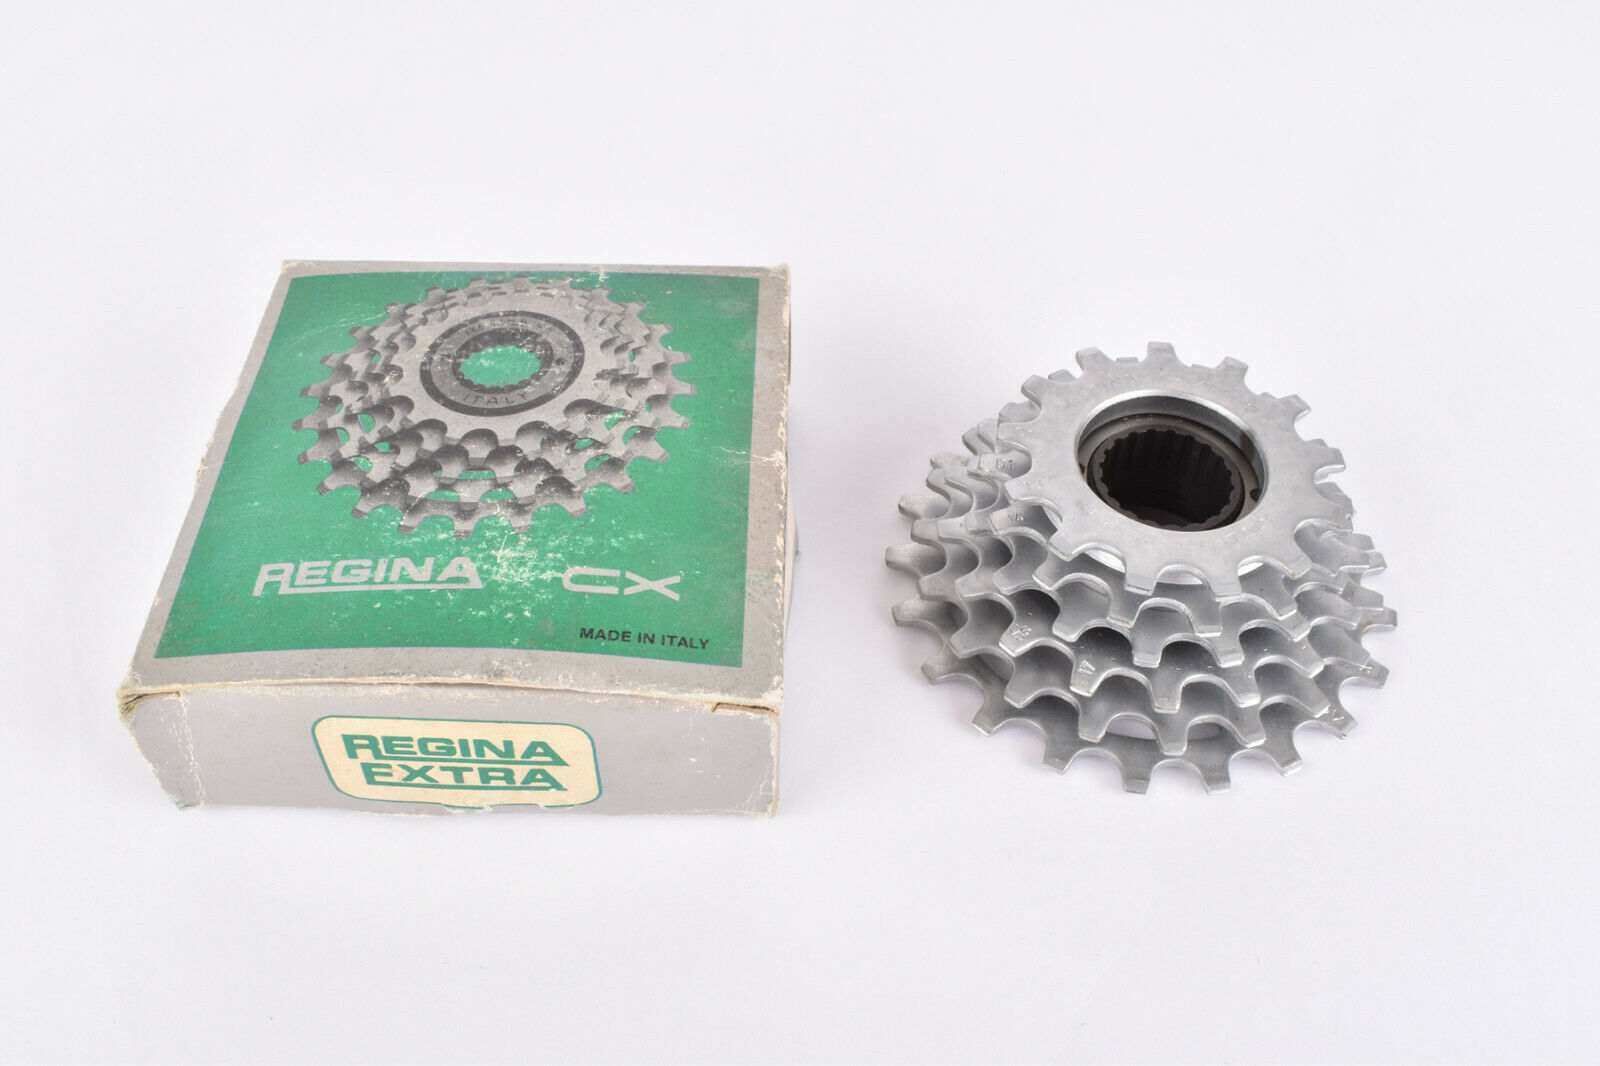 NOS NIB Regina CX CX S 6 Speed Freewheel with 13-21 teeth and French Threading